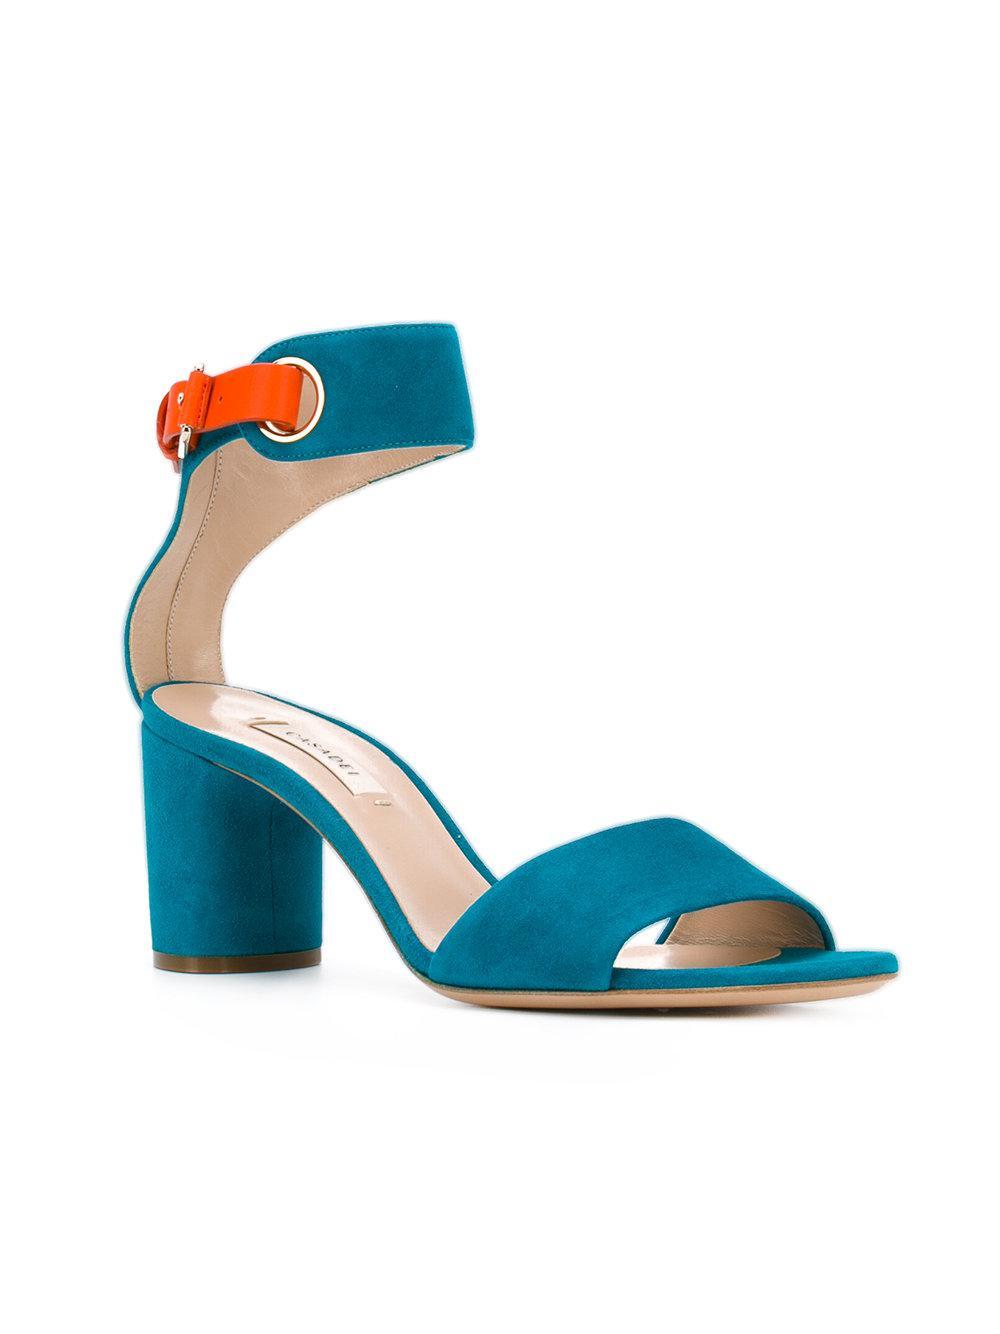 chain block sandals - Blue Casadei 6n27VGcsS